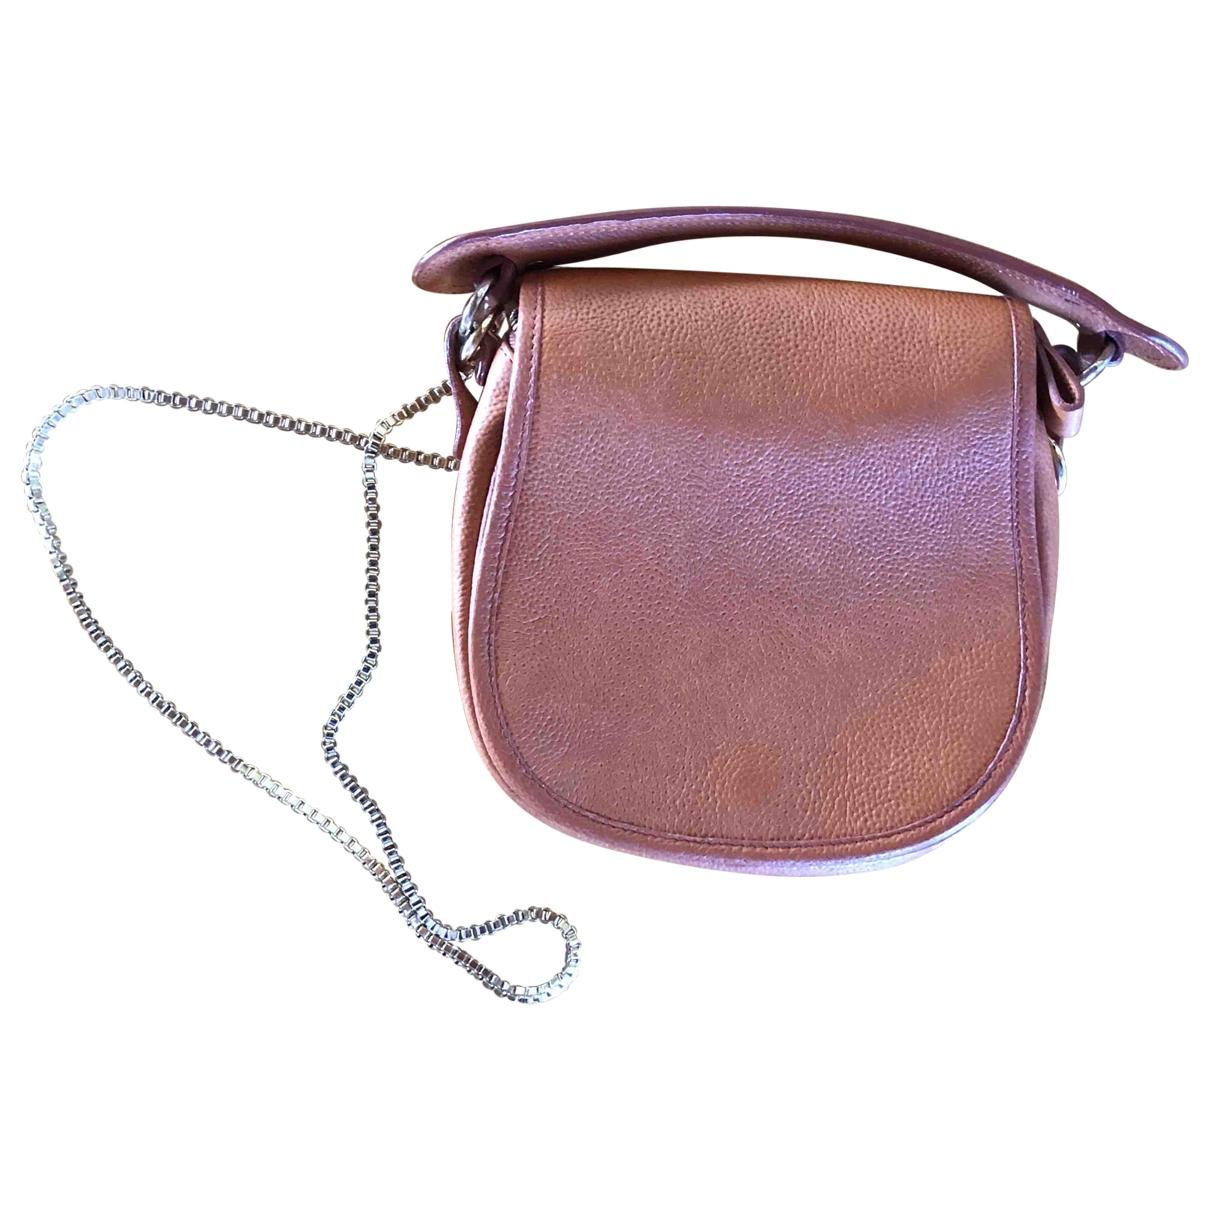 Carven \N Brown Leather handbag for Women \N